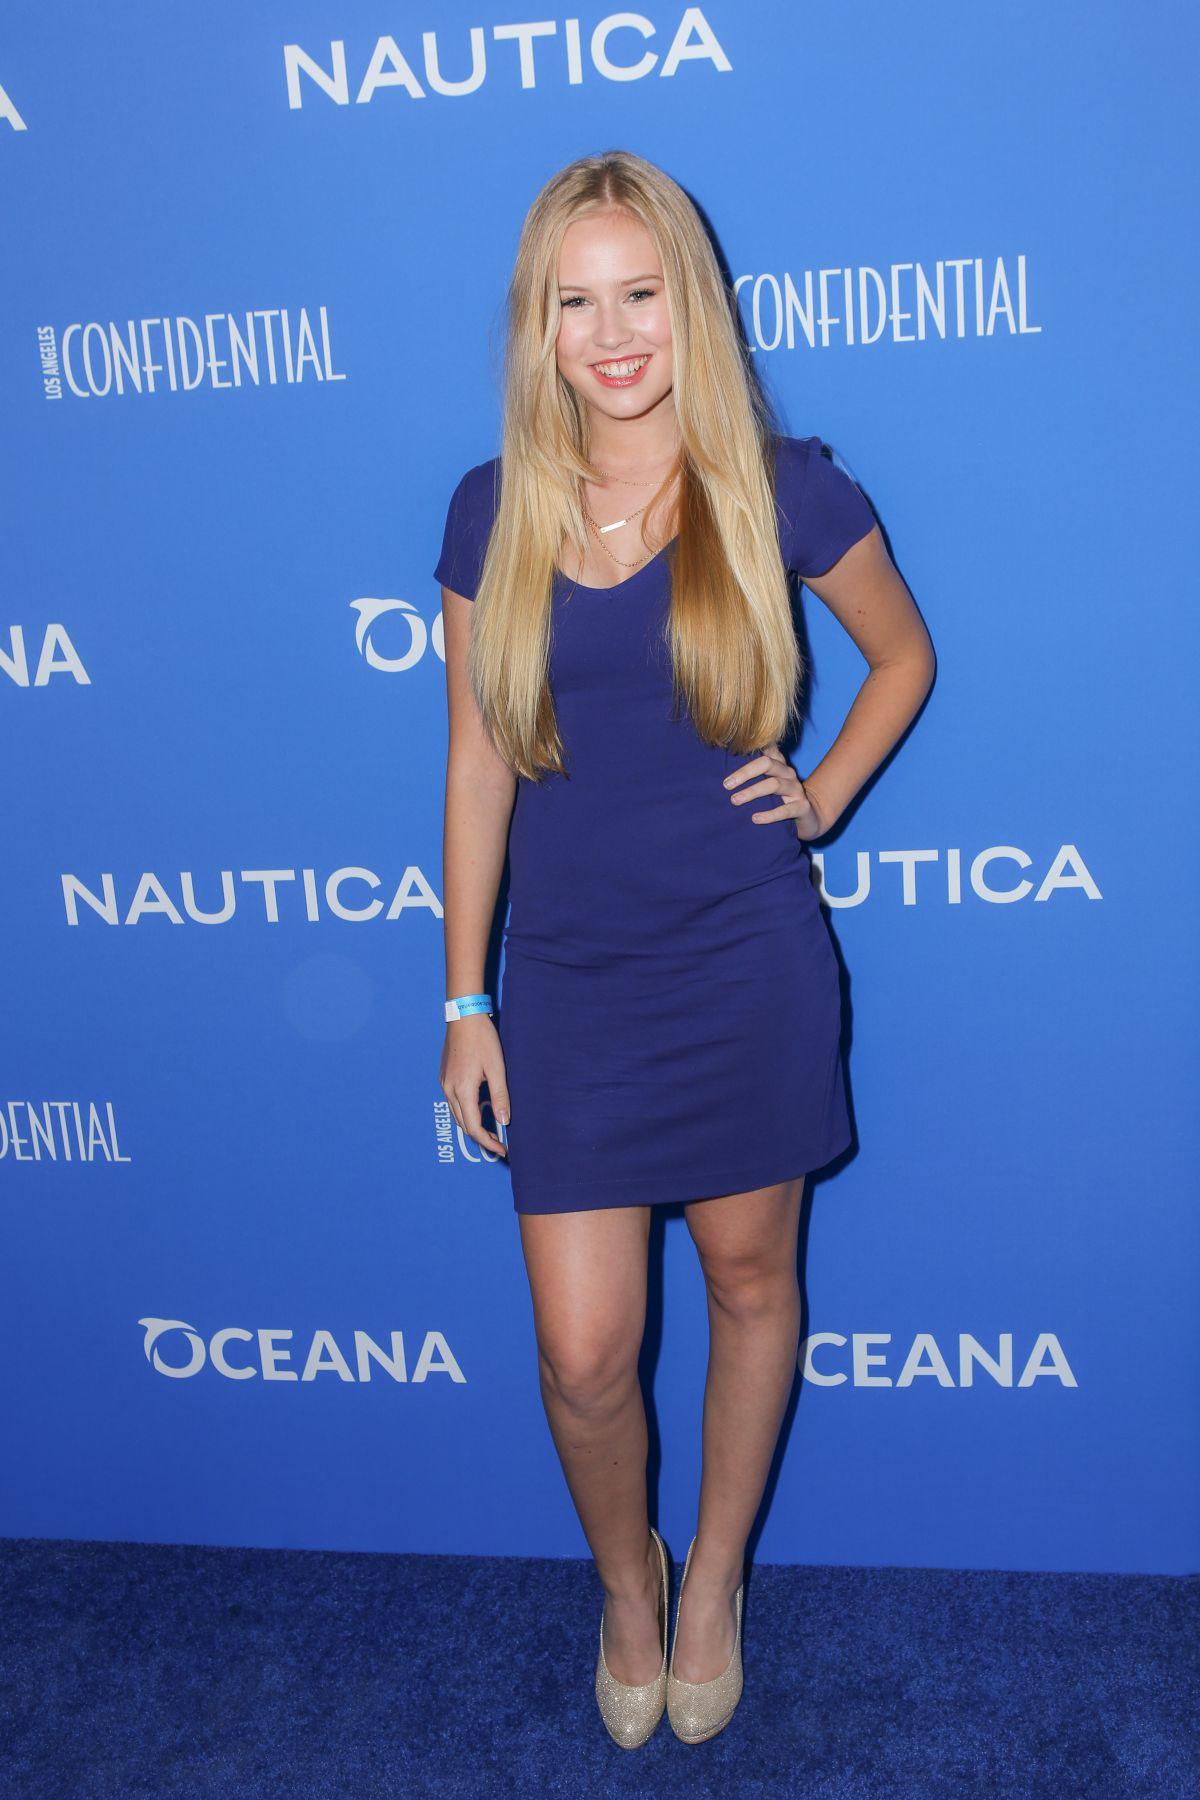 DANIKA YAROSH at 3rd Annual Nautica Oceana Beach House Party in Santa Monica